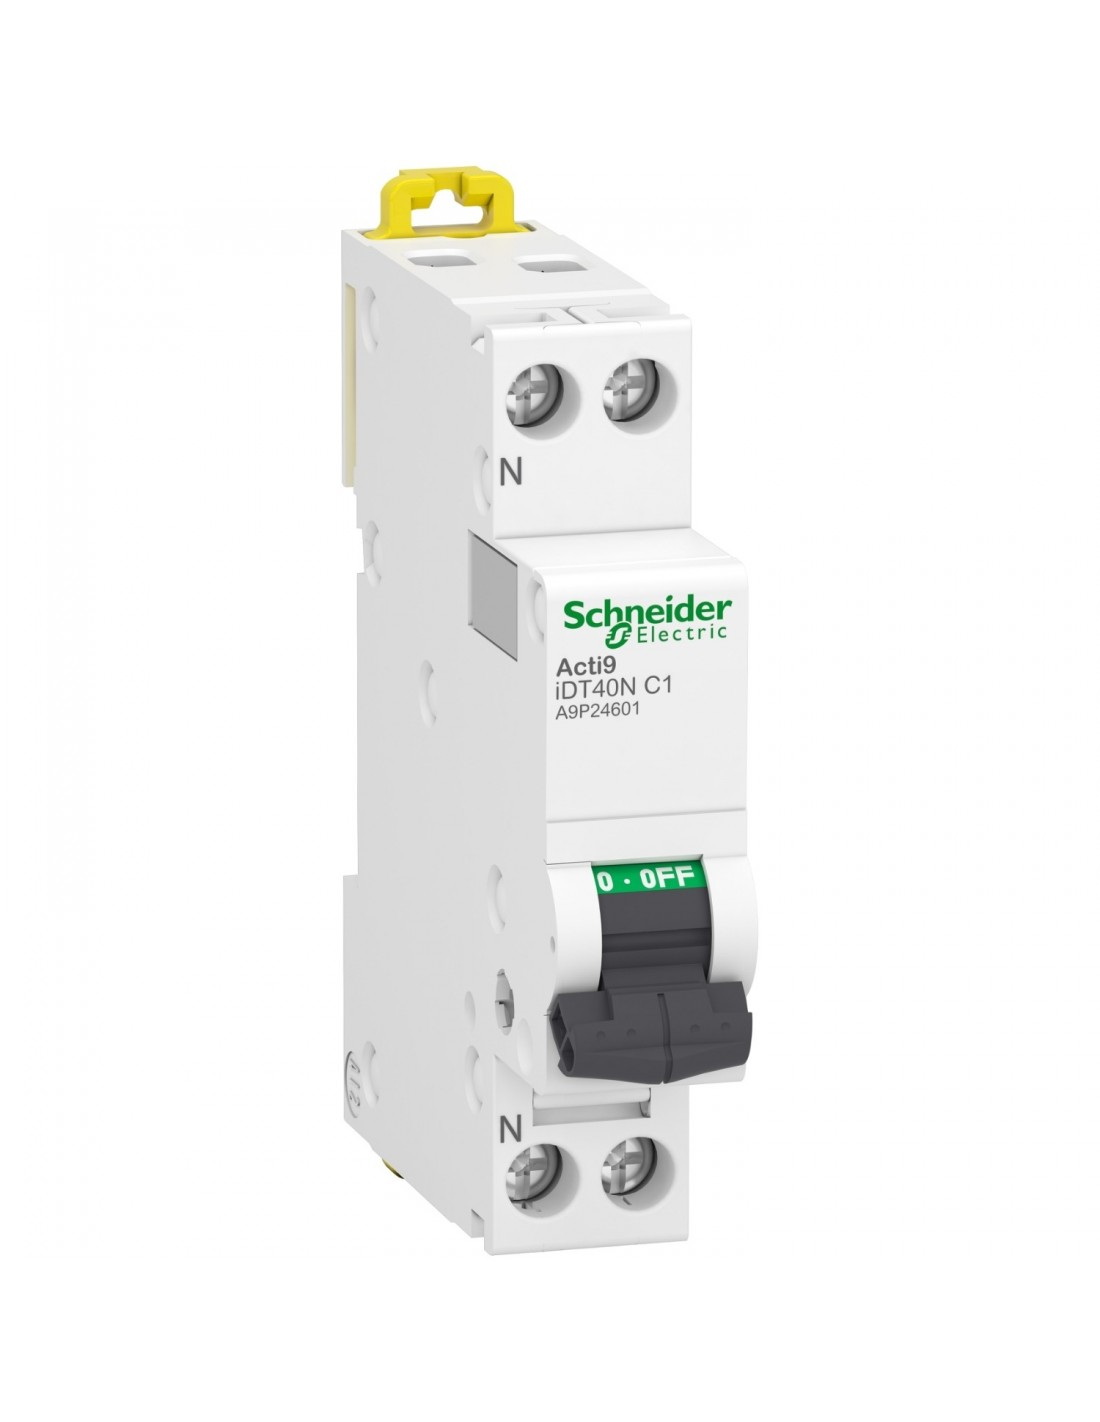 Schneider Acti9 iDT40N - disjoncteur modulaire - 1P+N C 10A 6000A/10kA A9P24610